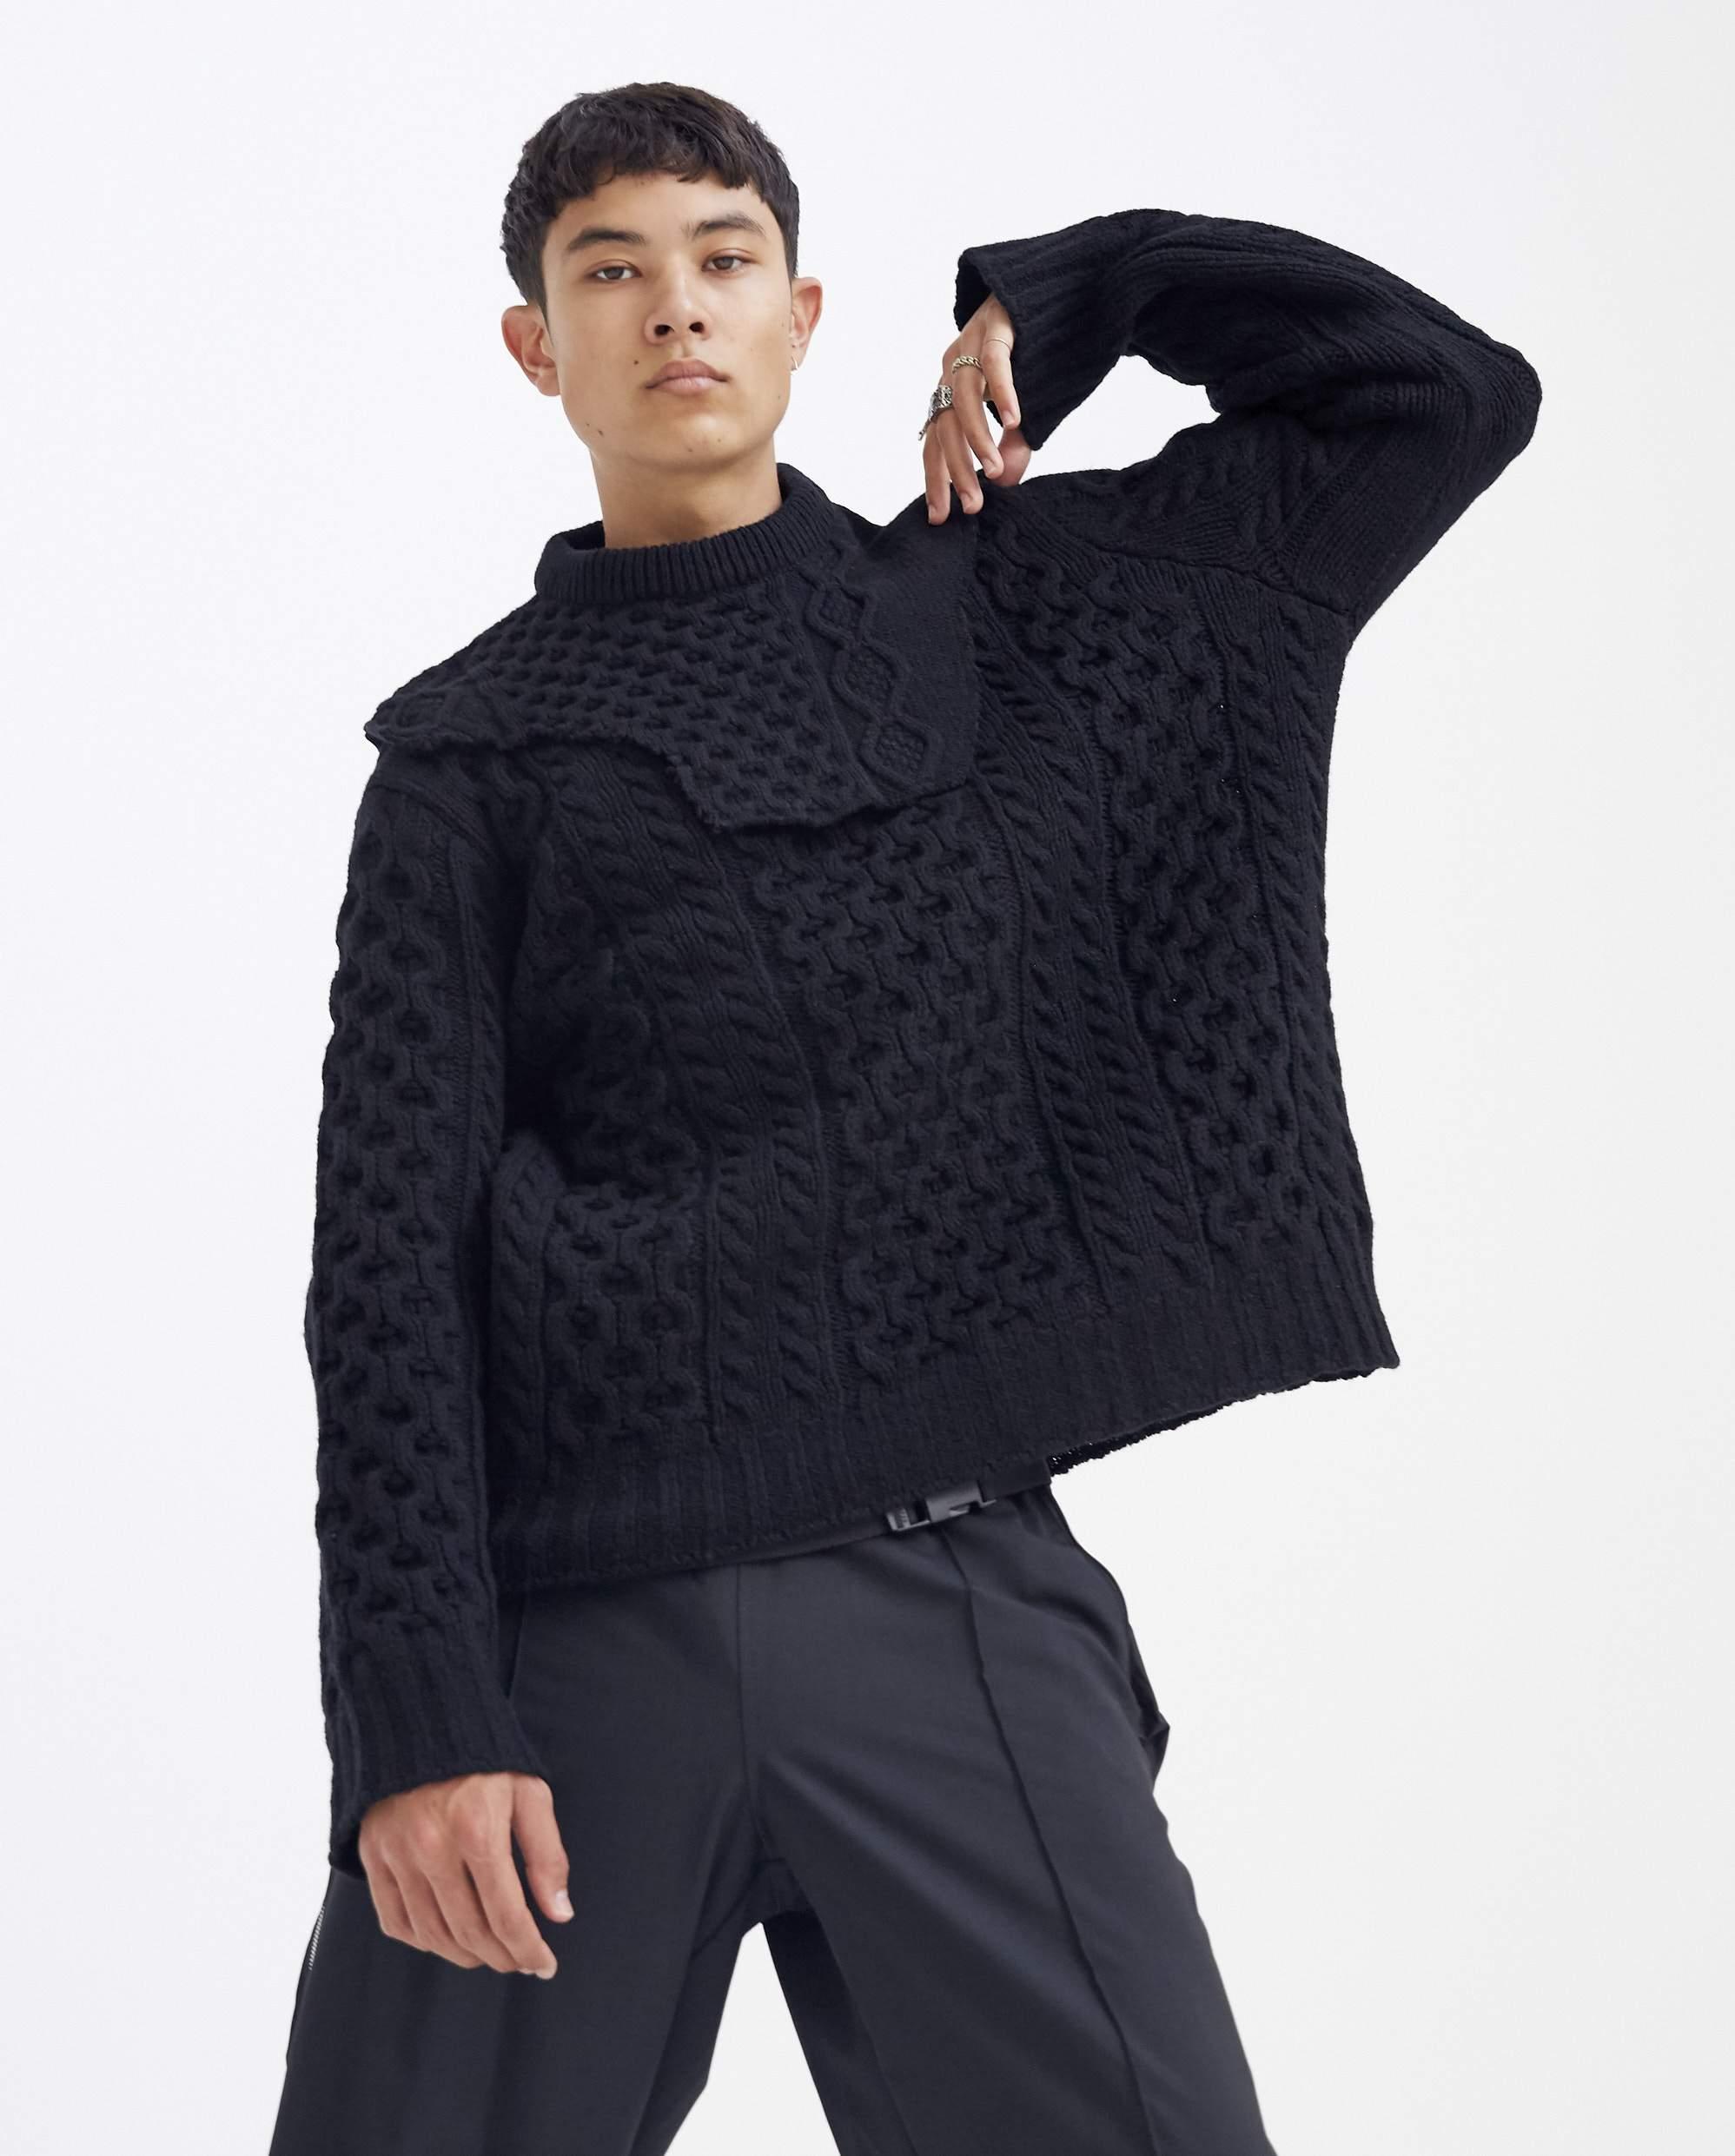 Raf Simons Wool Aran Knit Sweater With Detachable Neck ...